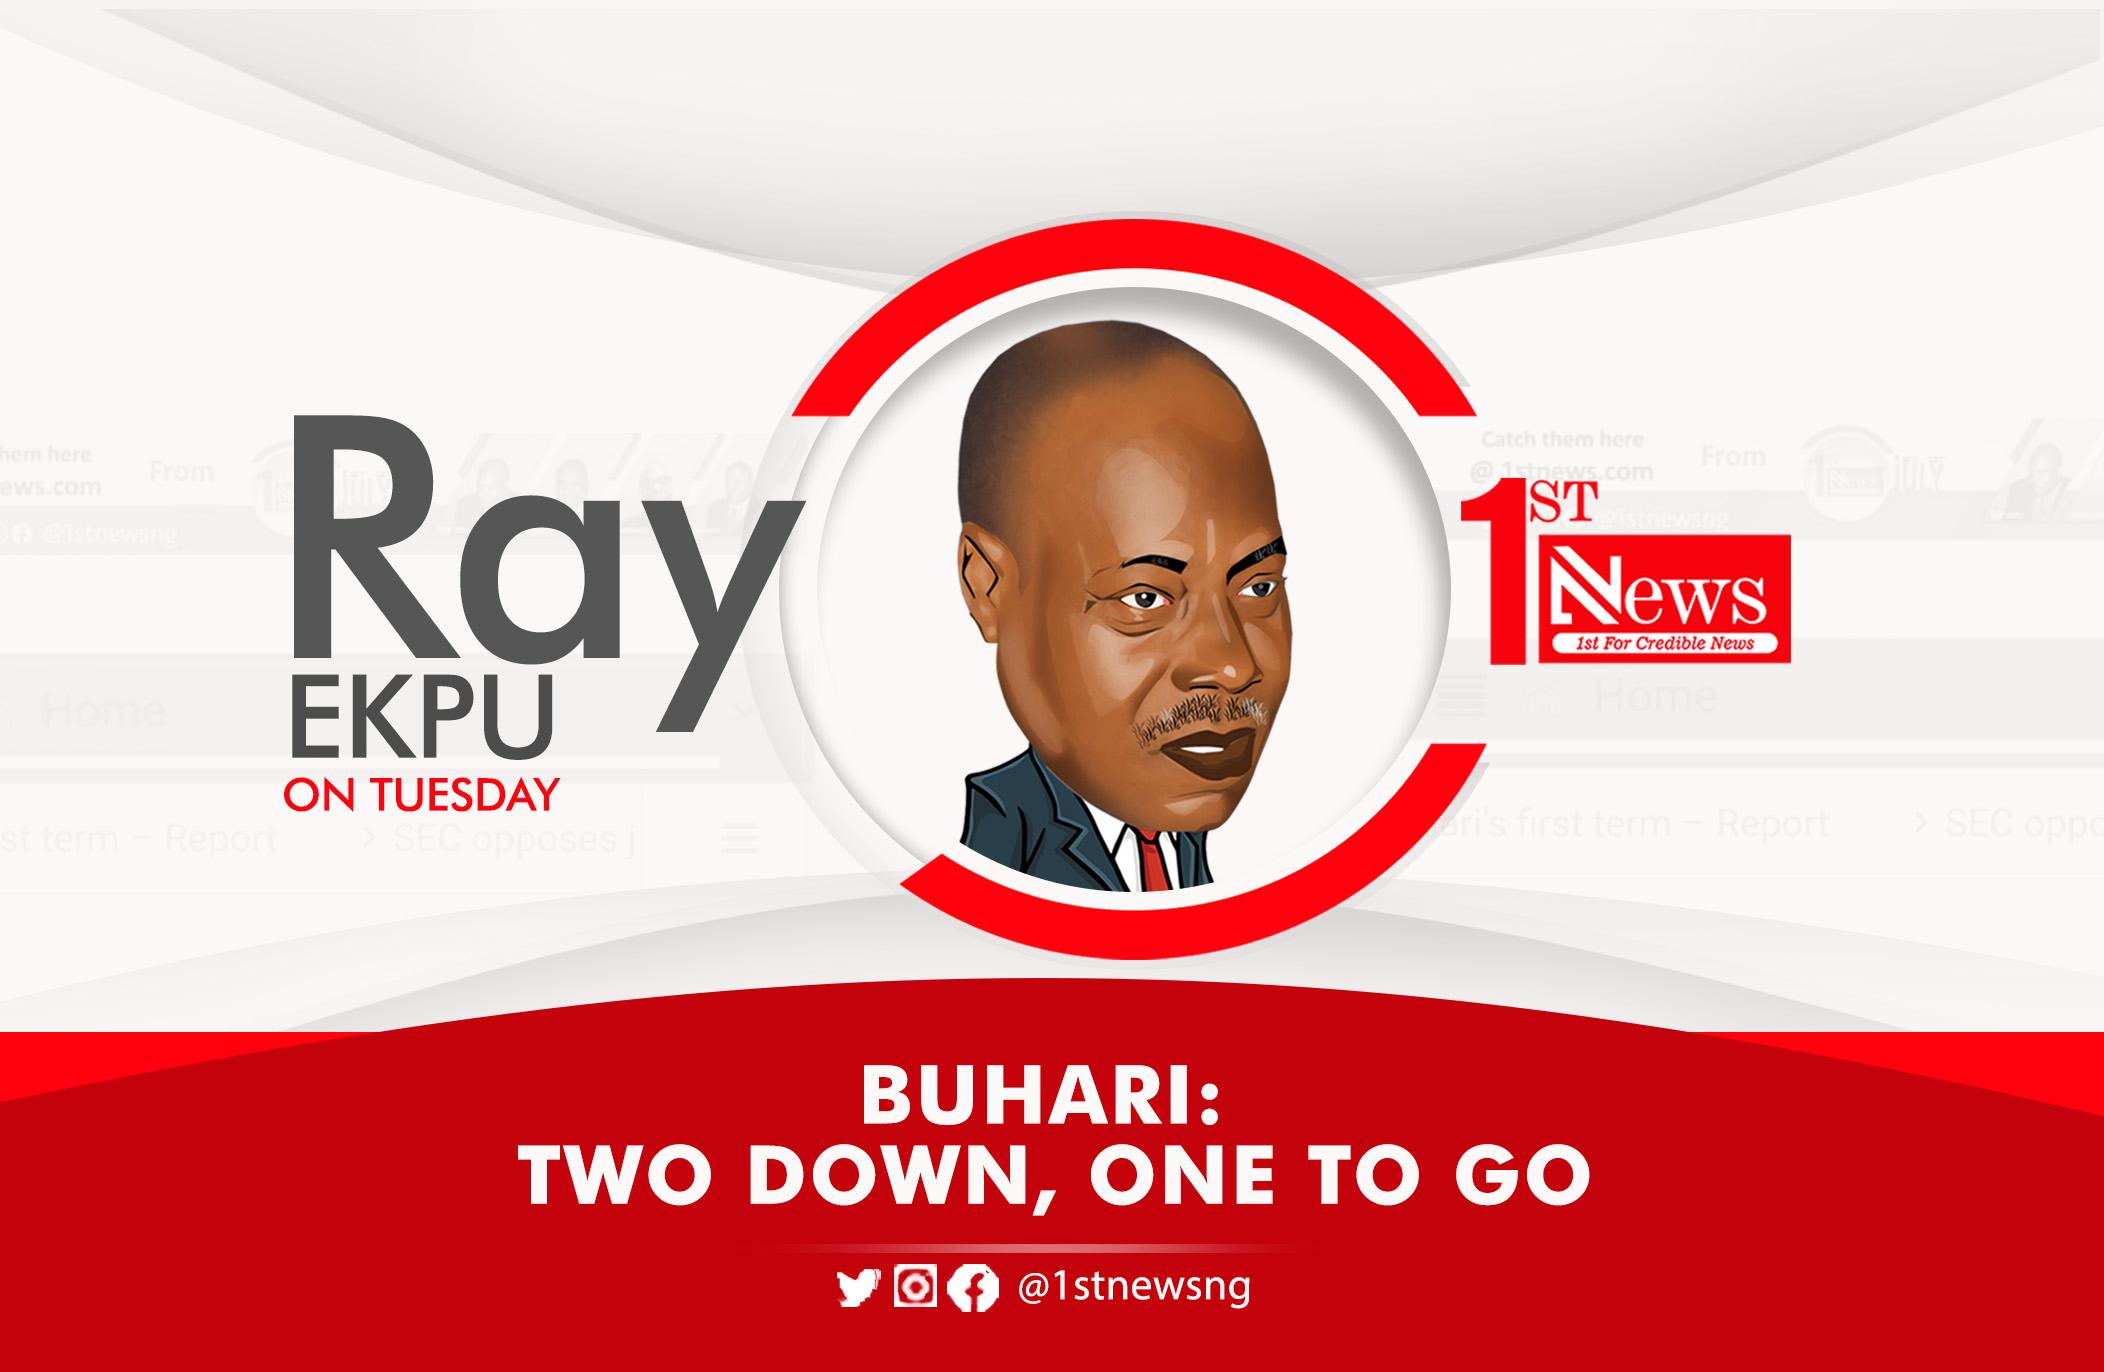 Buhari: Two down, one to Go – Ray Ekpu